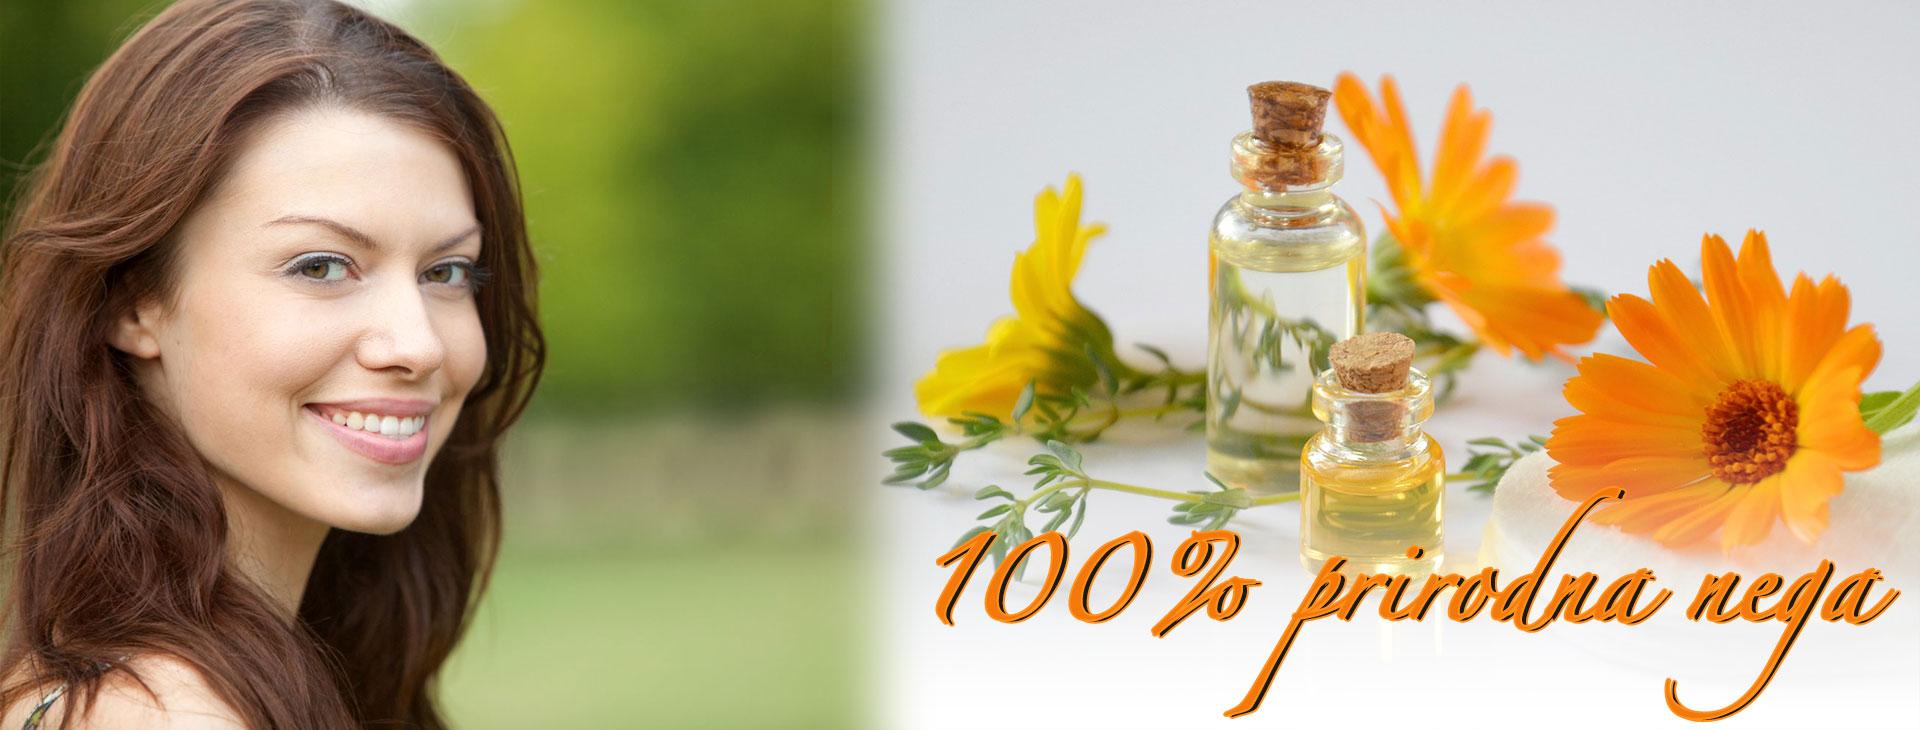 Marigold prirodna kozmetika